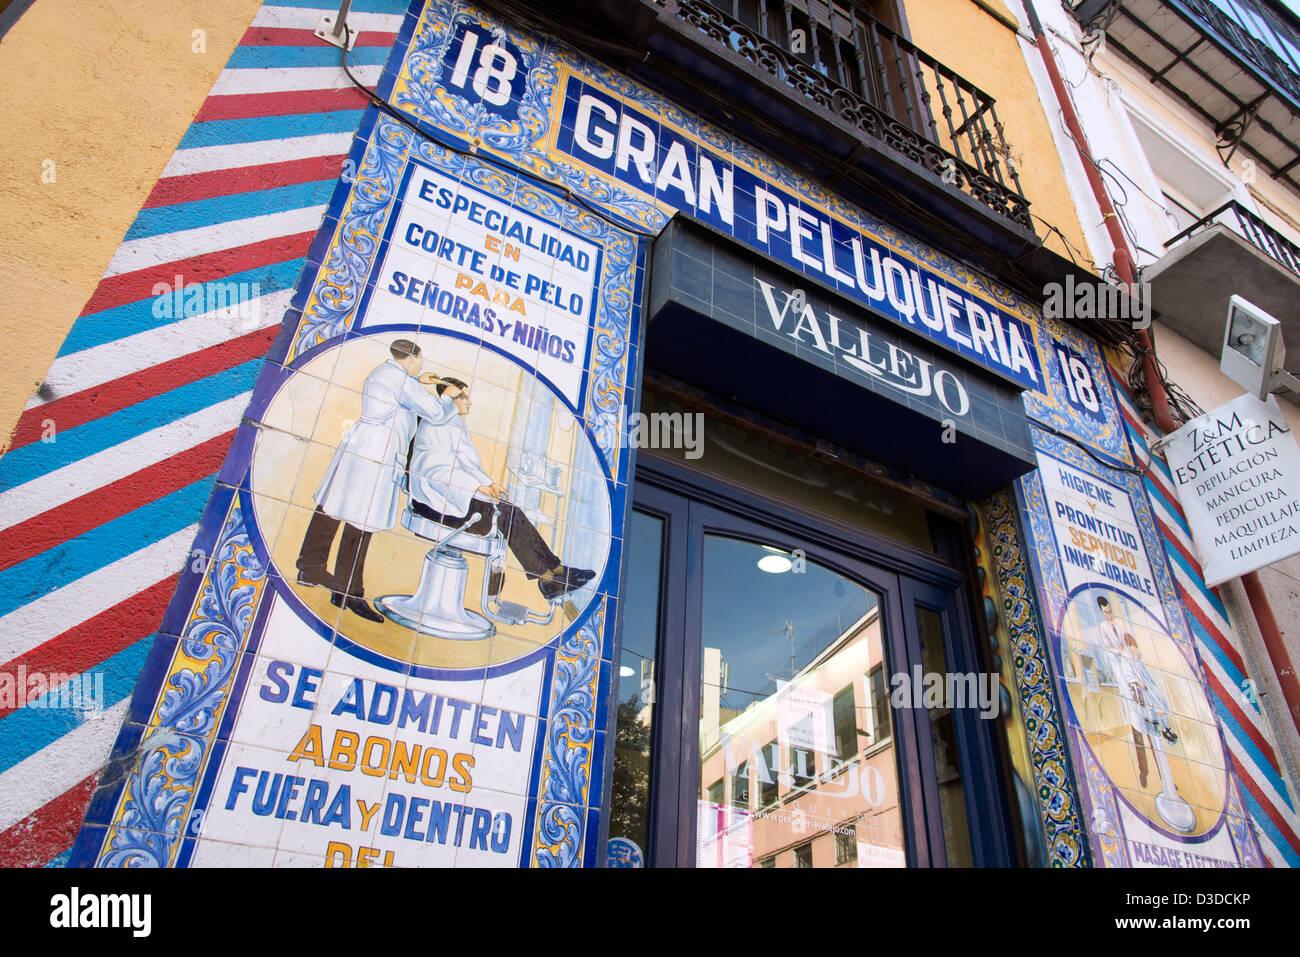 Tiled shopfront of the Gran Peluqueria Vallejo, Madrid, Spain - Stock Image